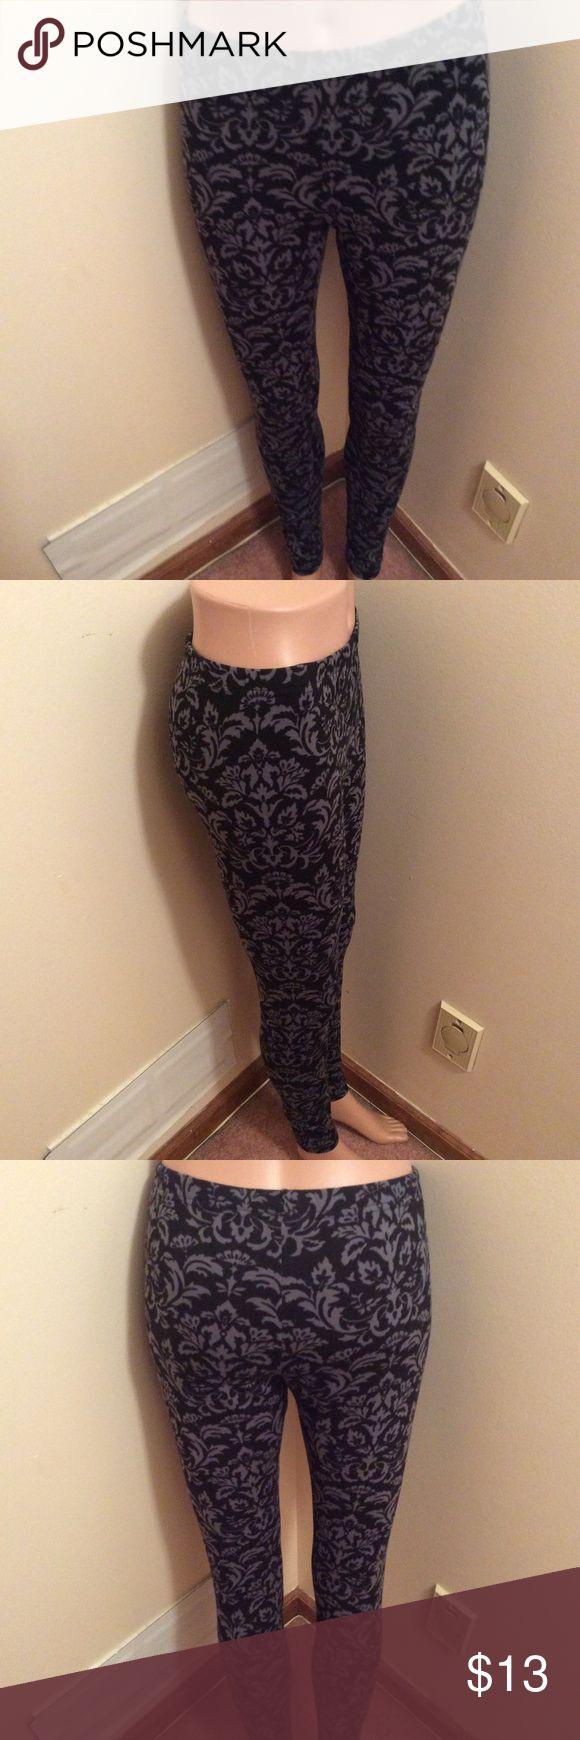 Floral leggings/Tights Black & greyish blue floral tights/leggings - fleece material - very soft & warm - new, never worn Pants Leggings